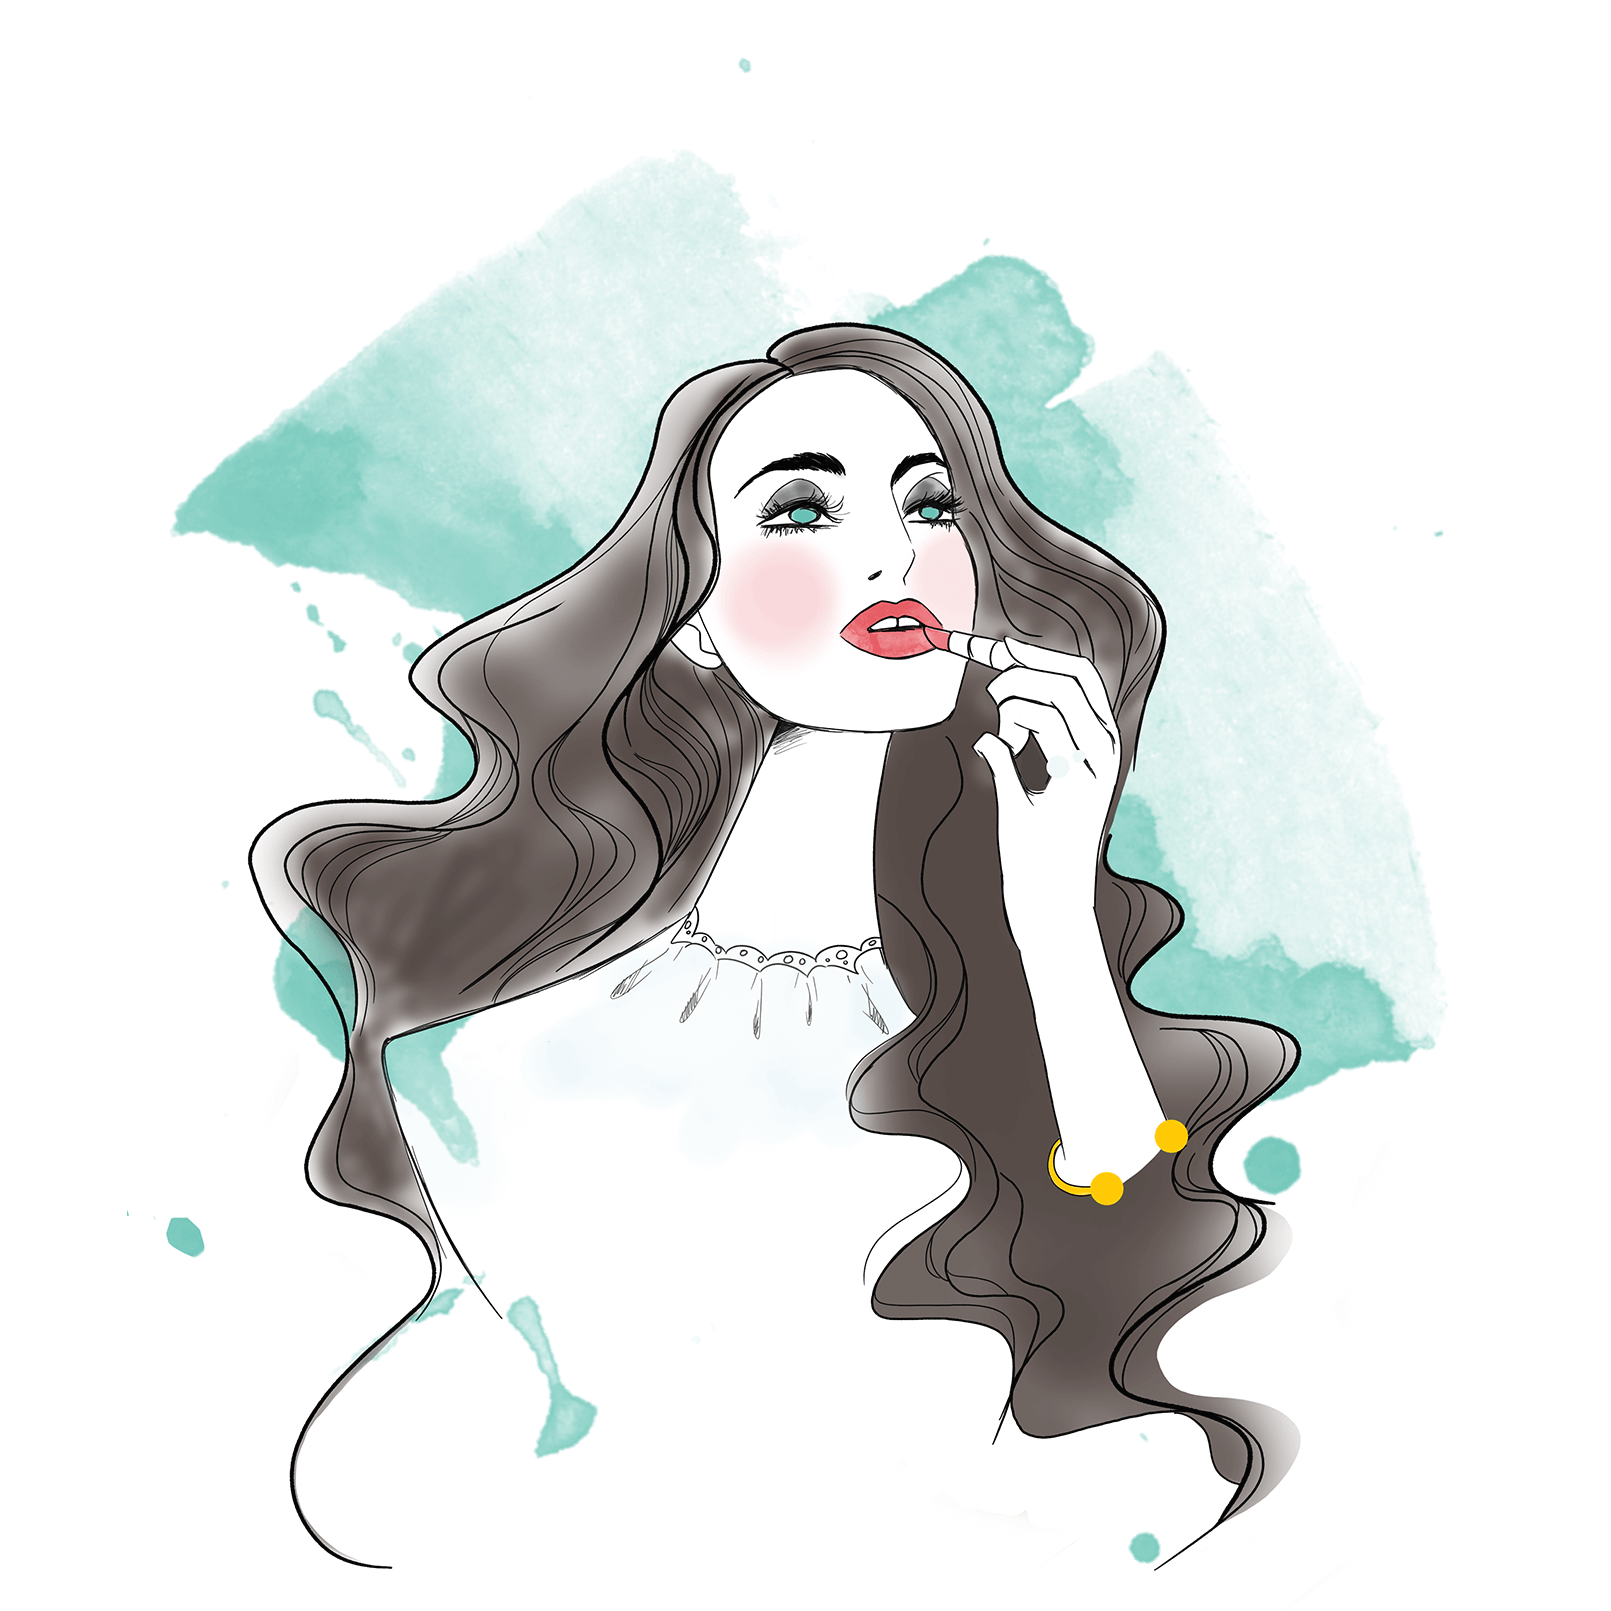 Influencer-Live Drawing auf dem FashionBloggerCafé WHITE EDITION zur Berlin Fashion Week. // Digital //